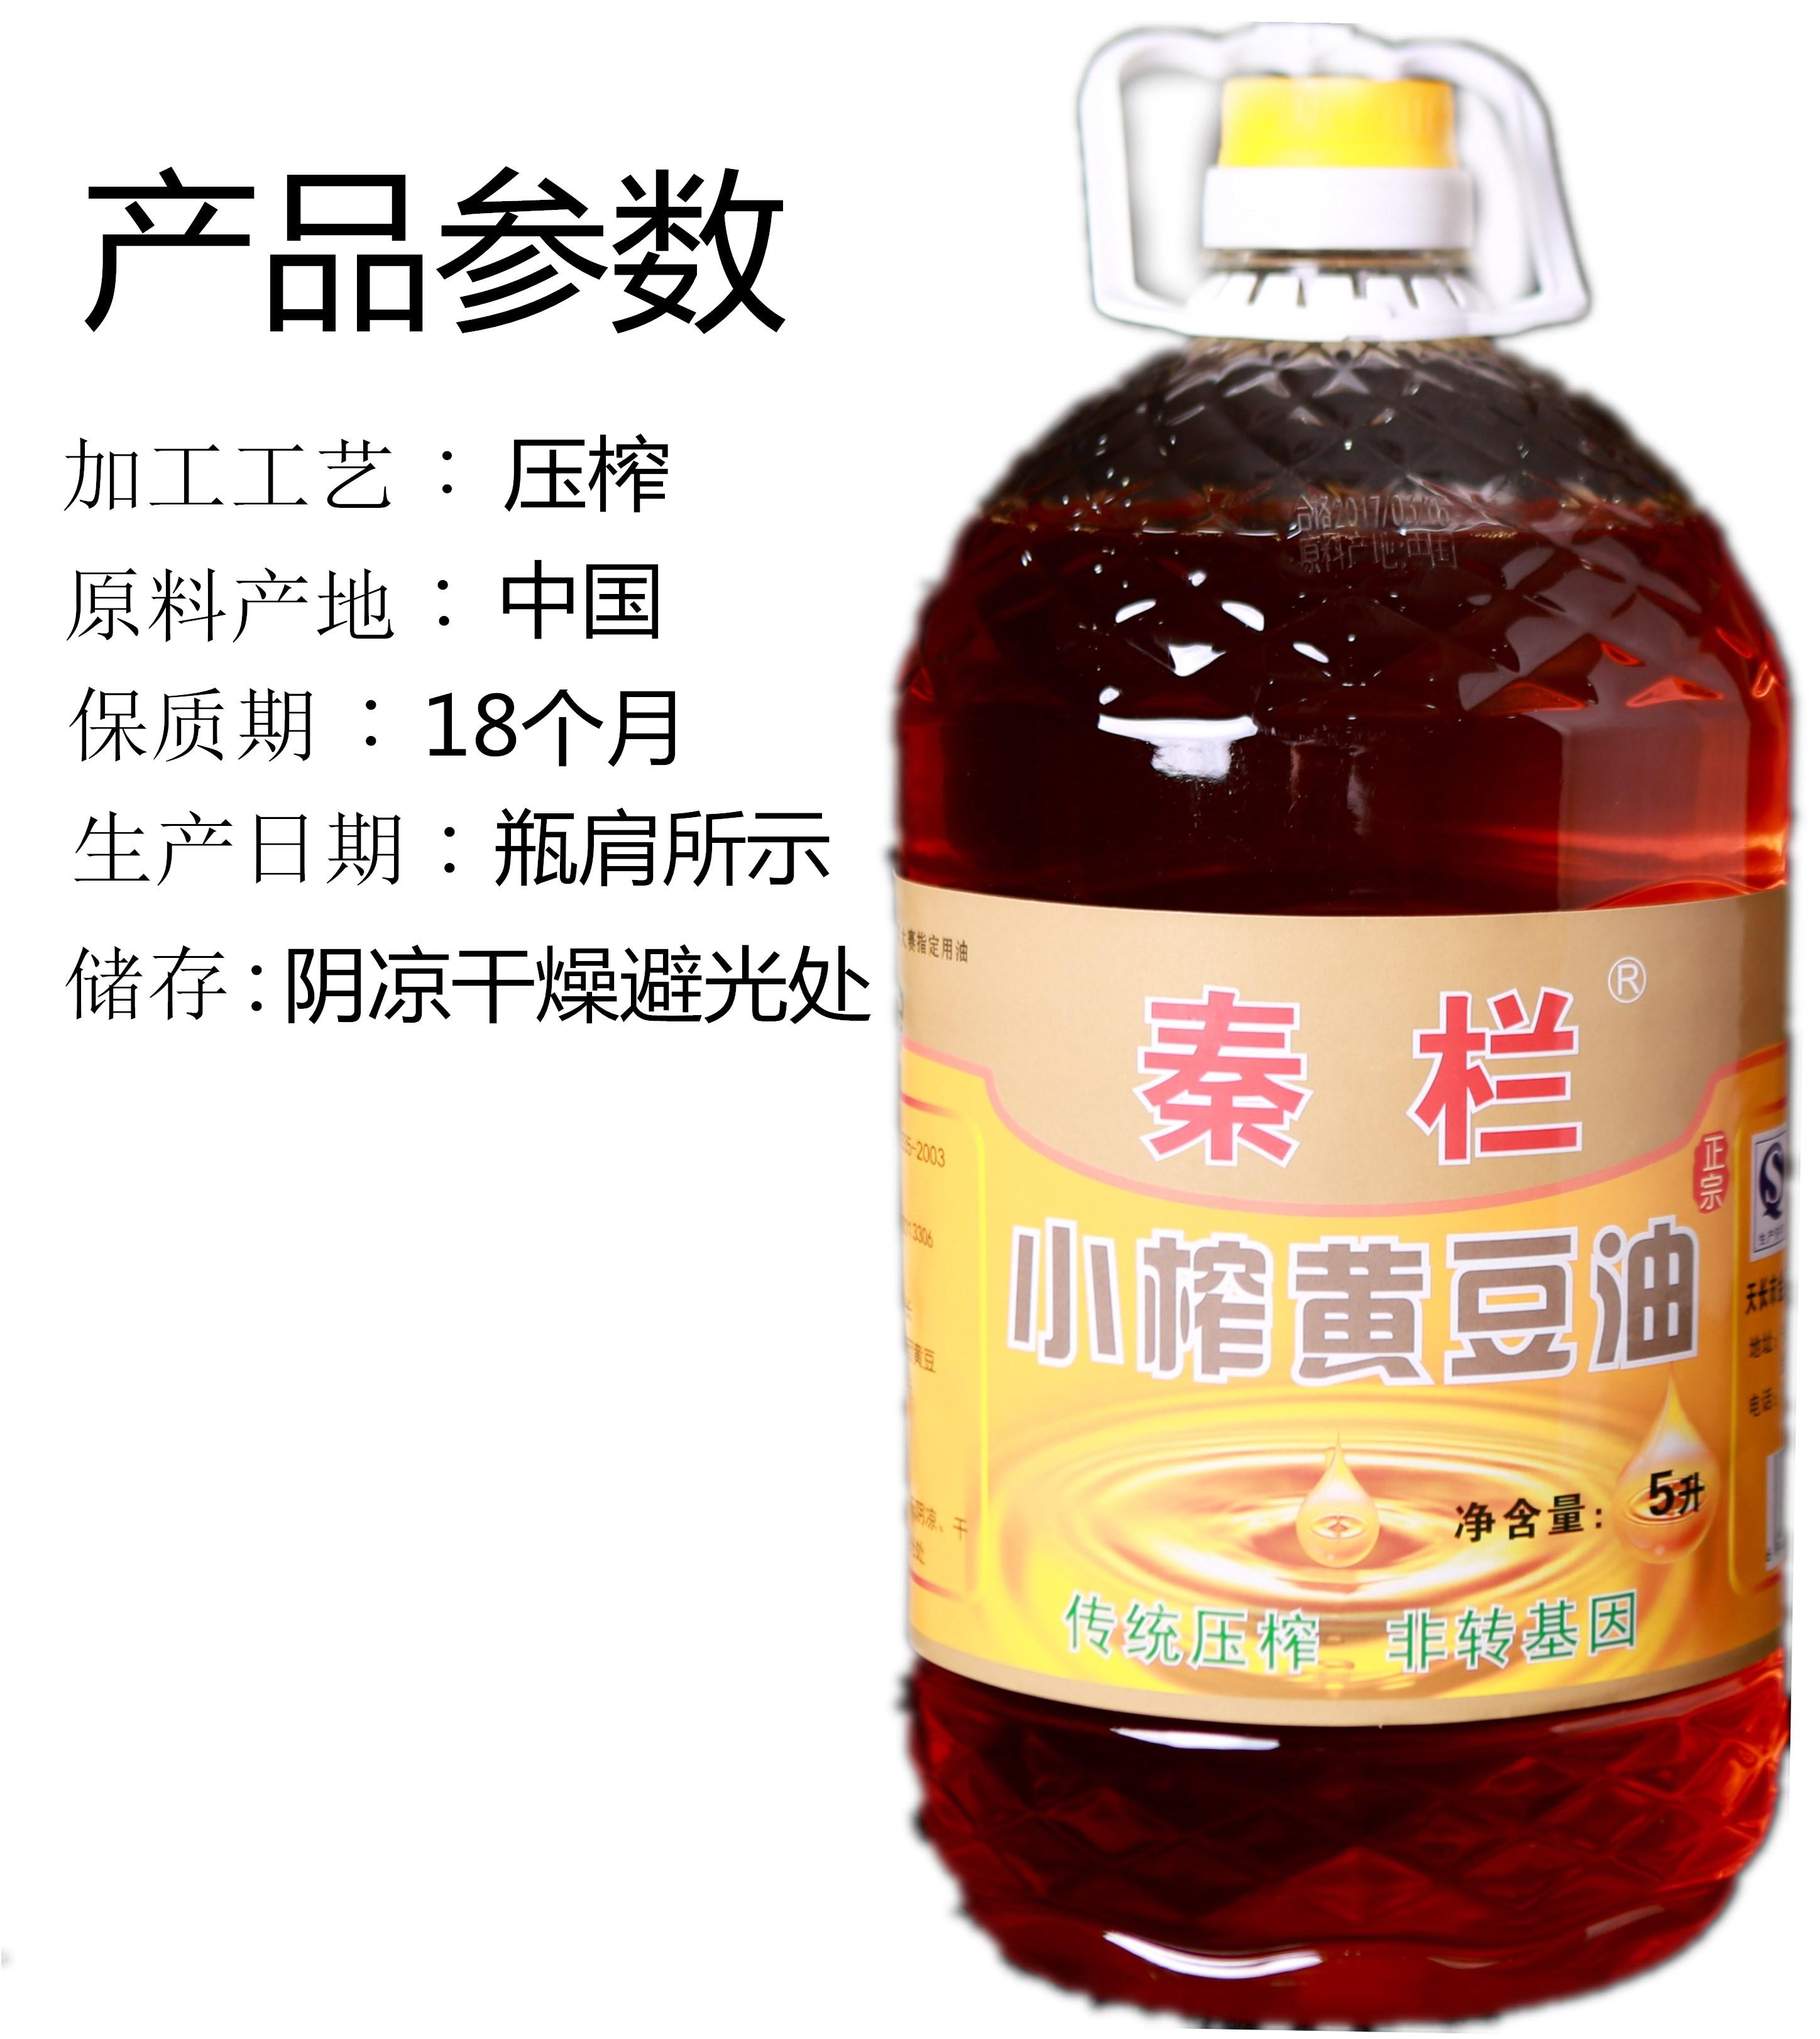 5L qinlan edible oil small press soybean oil traditional press non transgenic Luzhou flavor